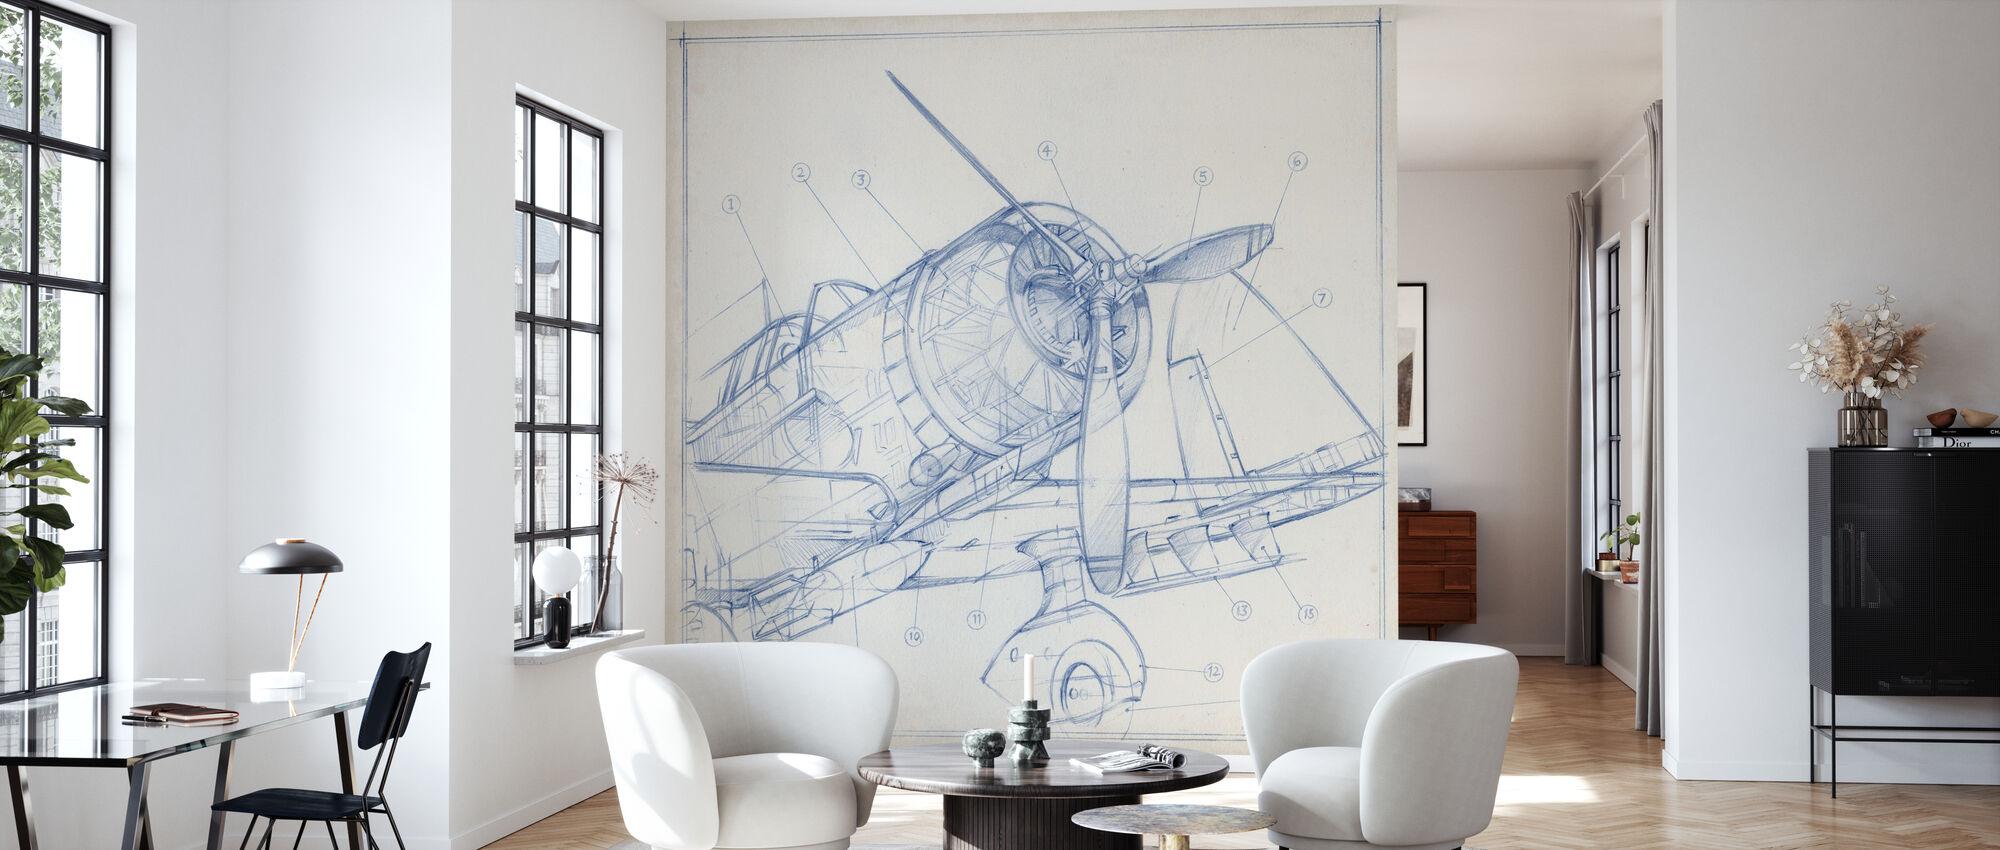 Airplane Mechanical Sketch - Wallpaper - Living Room